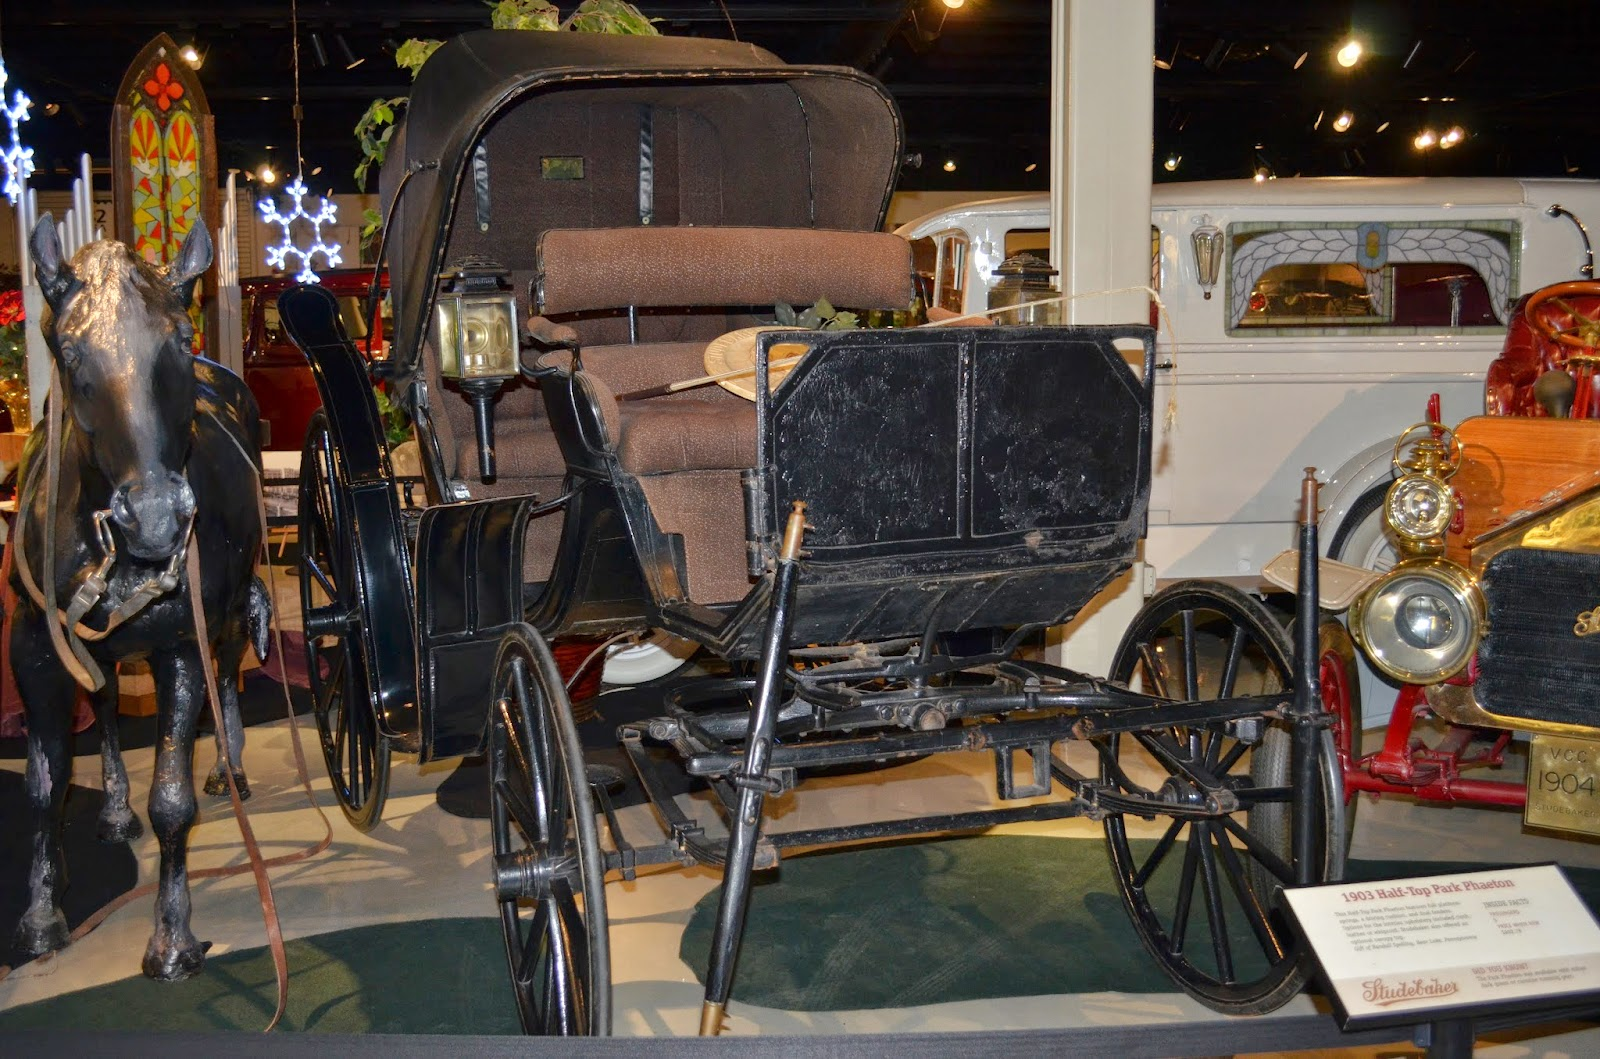 Turnerbudds Car Blog: The Studebaker National Museum